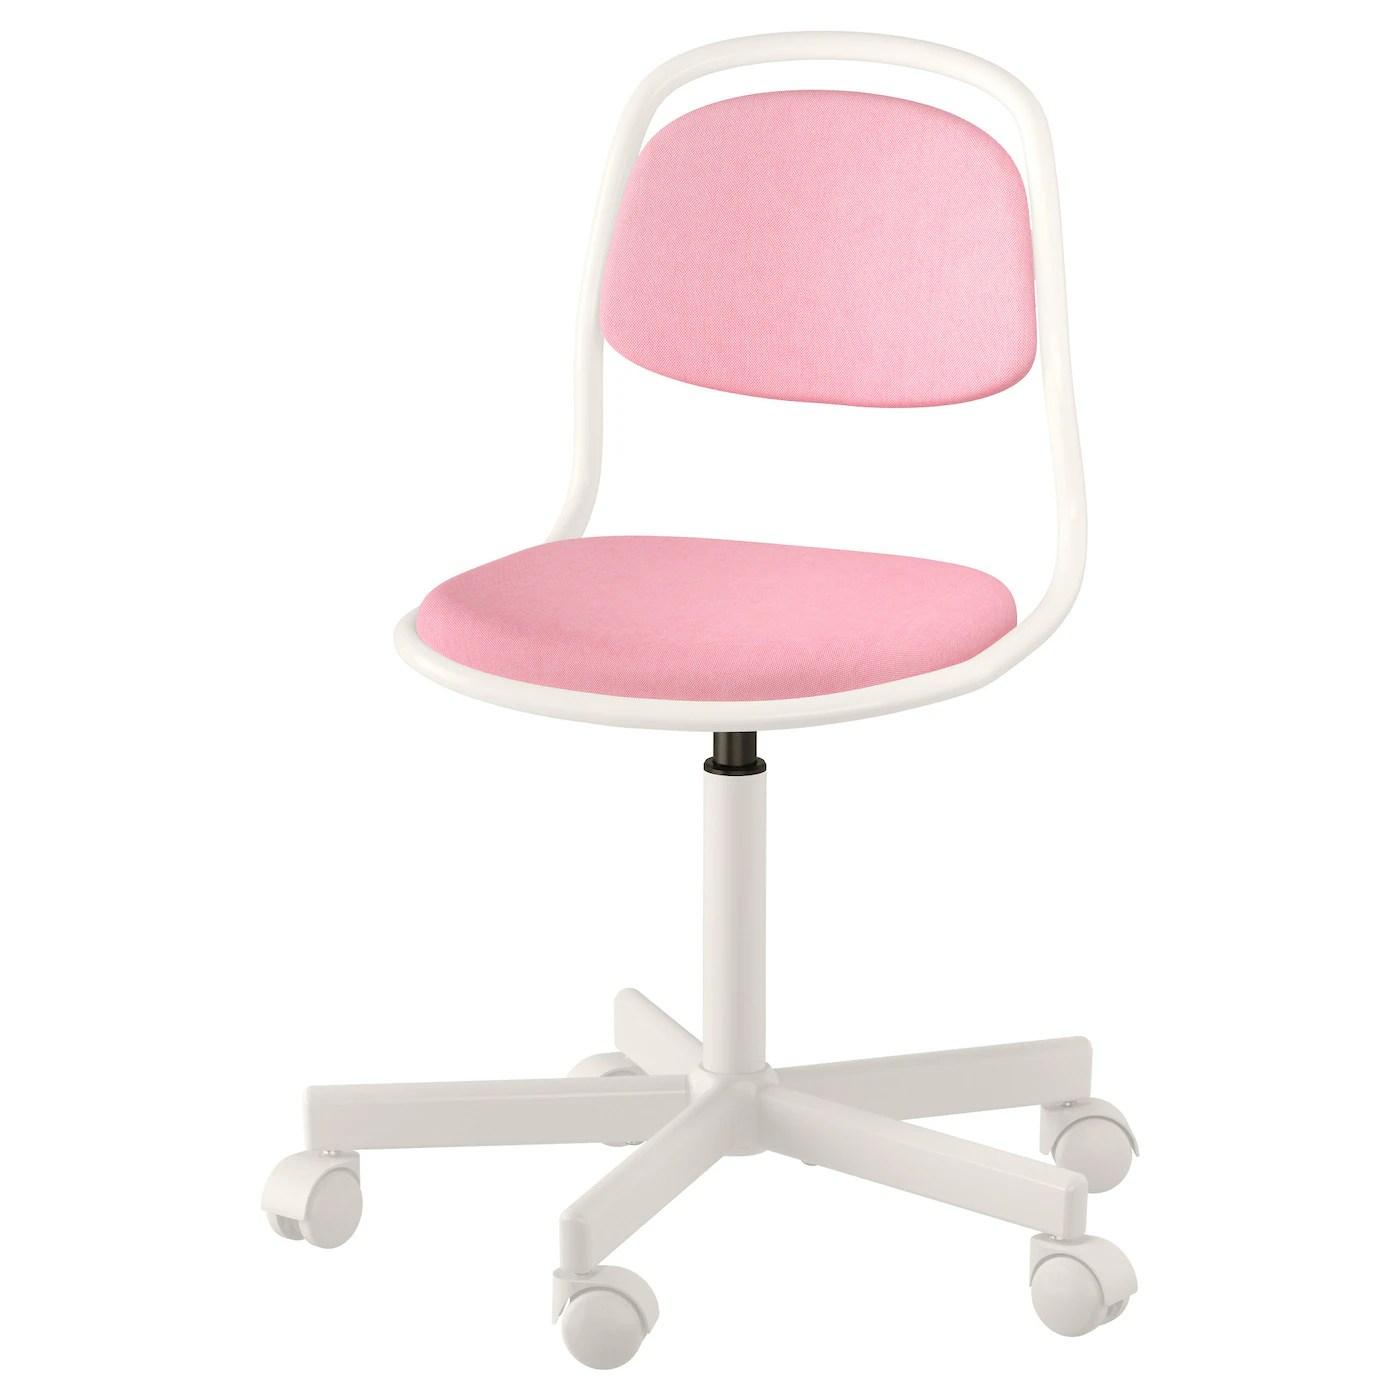 desk chair pink large round swivel ÖrfjÄll children 39s white vissle ikea